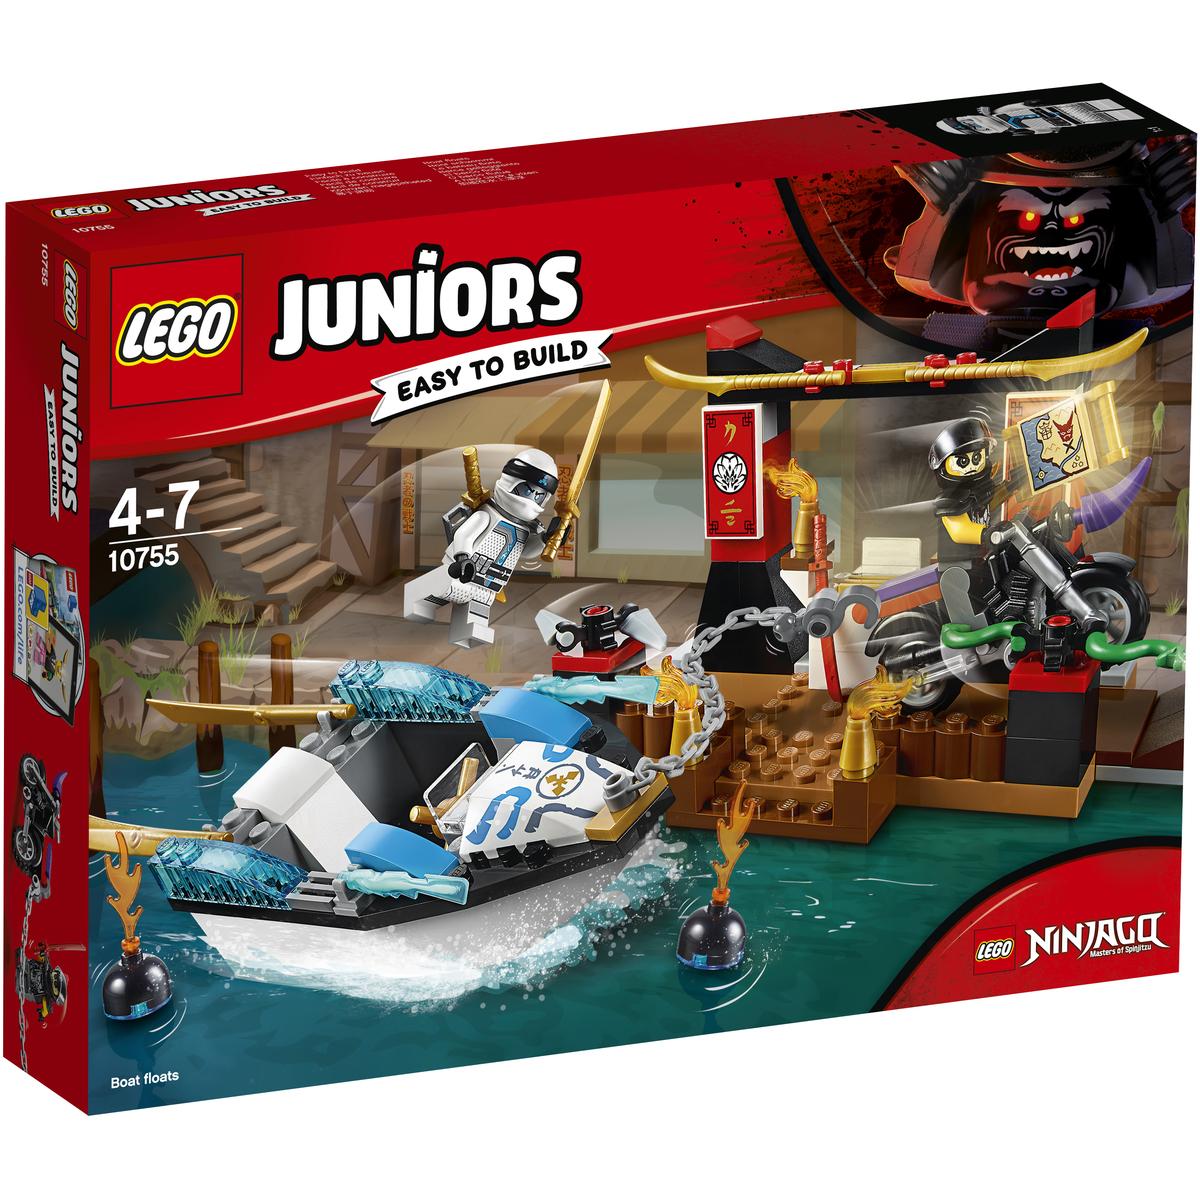 10755 Zane's Ninja Boat Pursuit